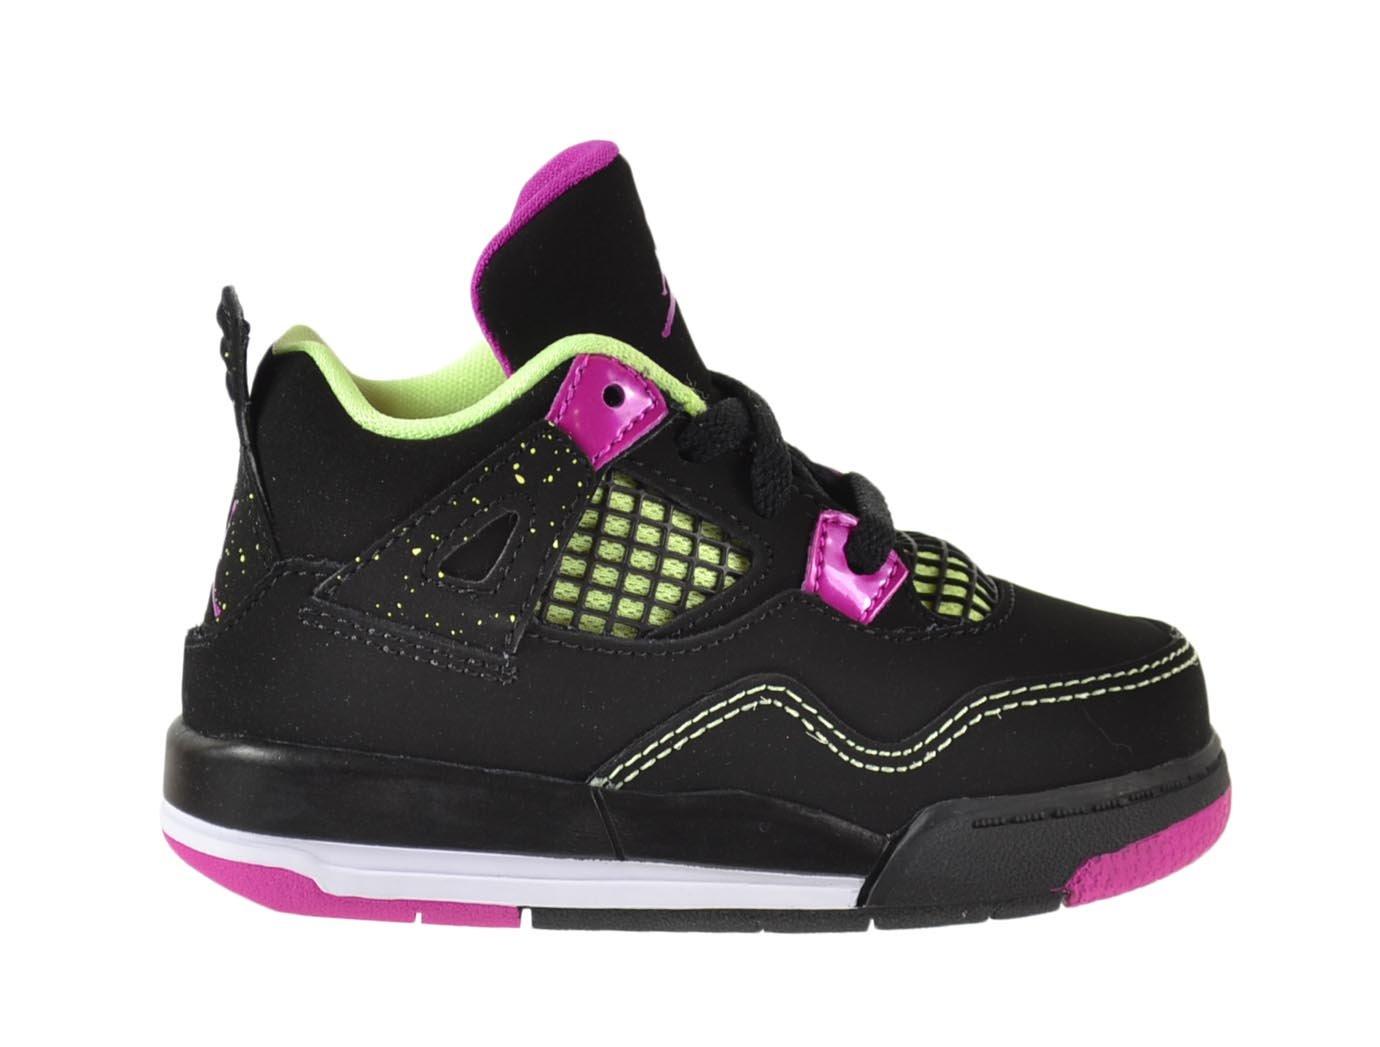 Jordan 4 Retro GT Baby Toddlers Shoes Black/Fuchsia Flash-Liquid Lime-White 705345-027 (6 M US) by Jordan